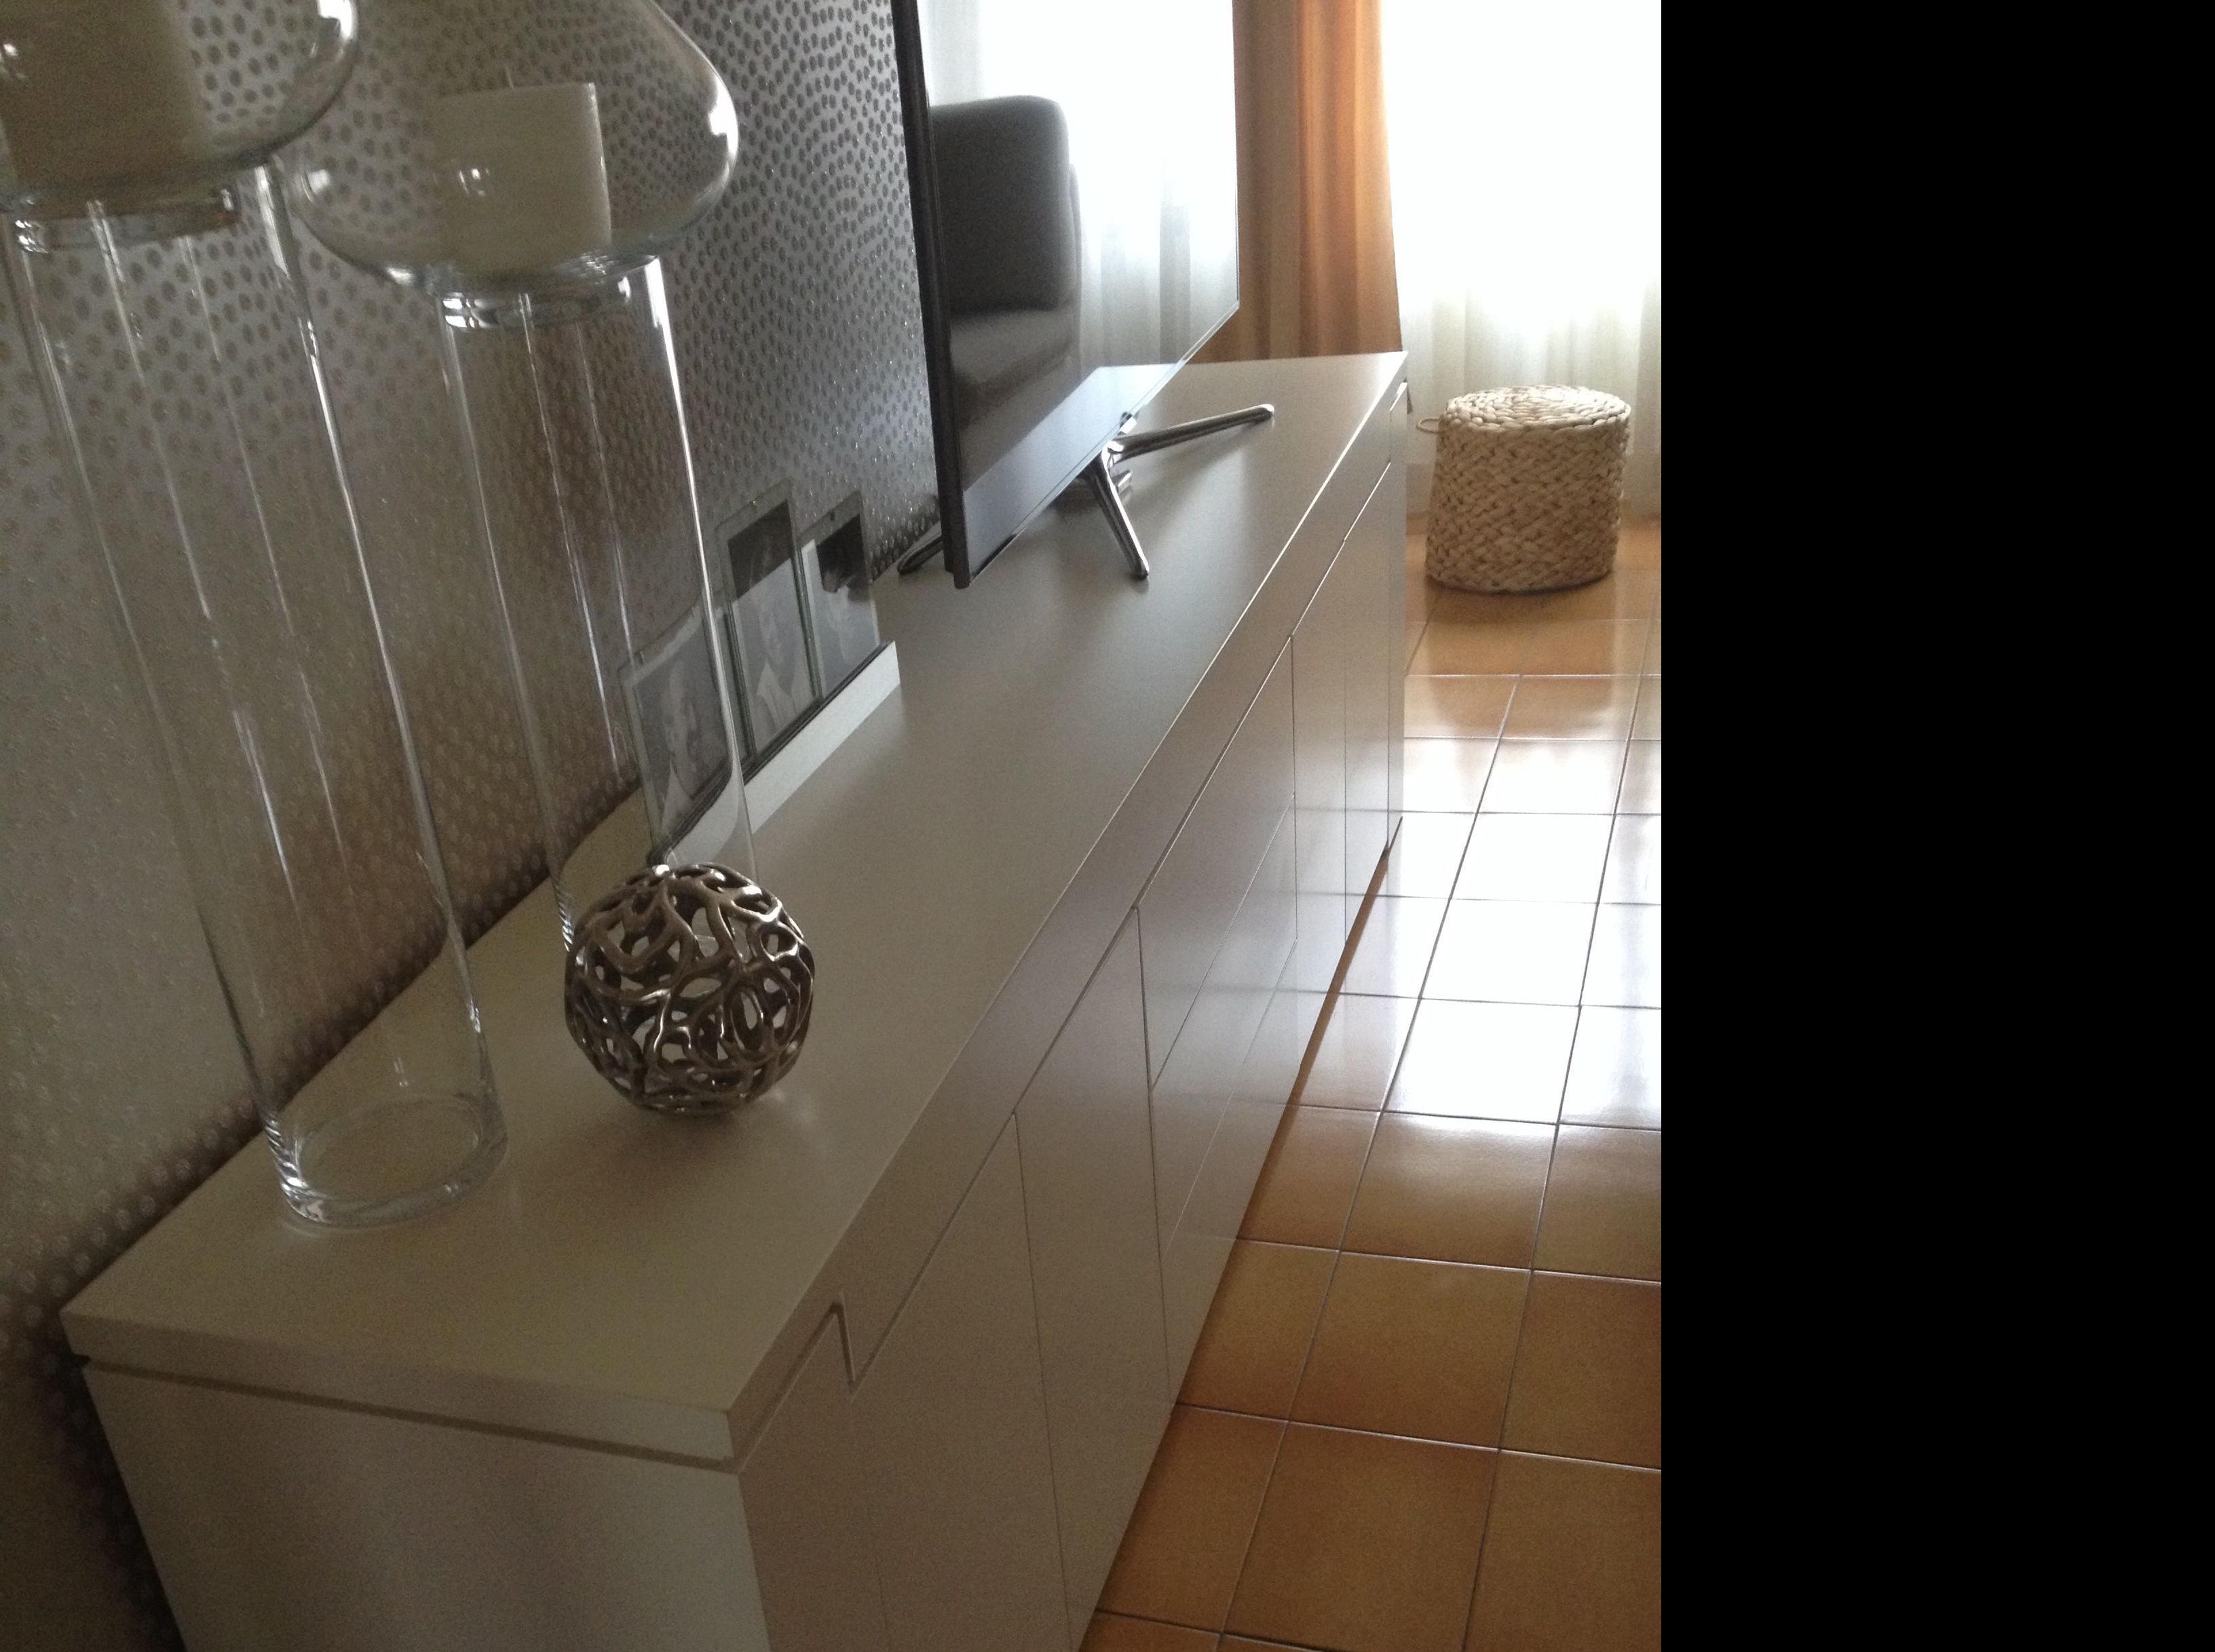 Mueble comedor / moble menjador lacat